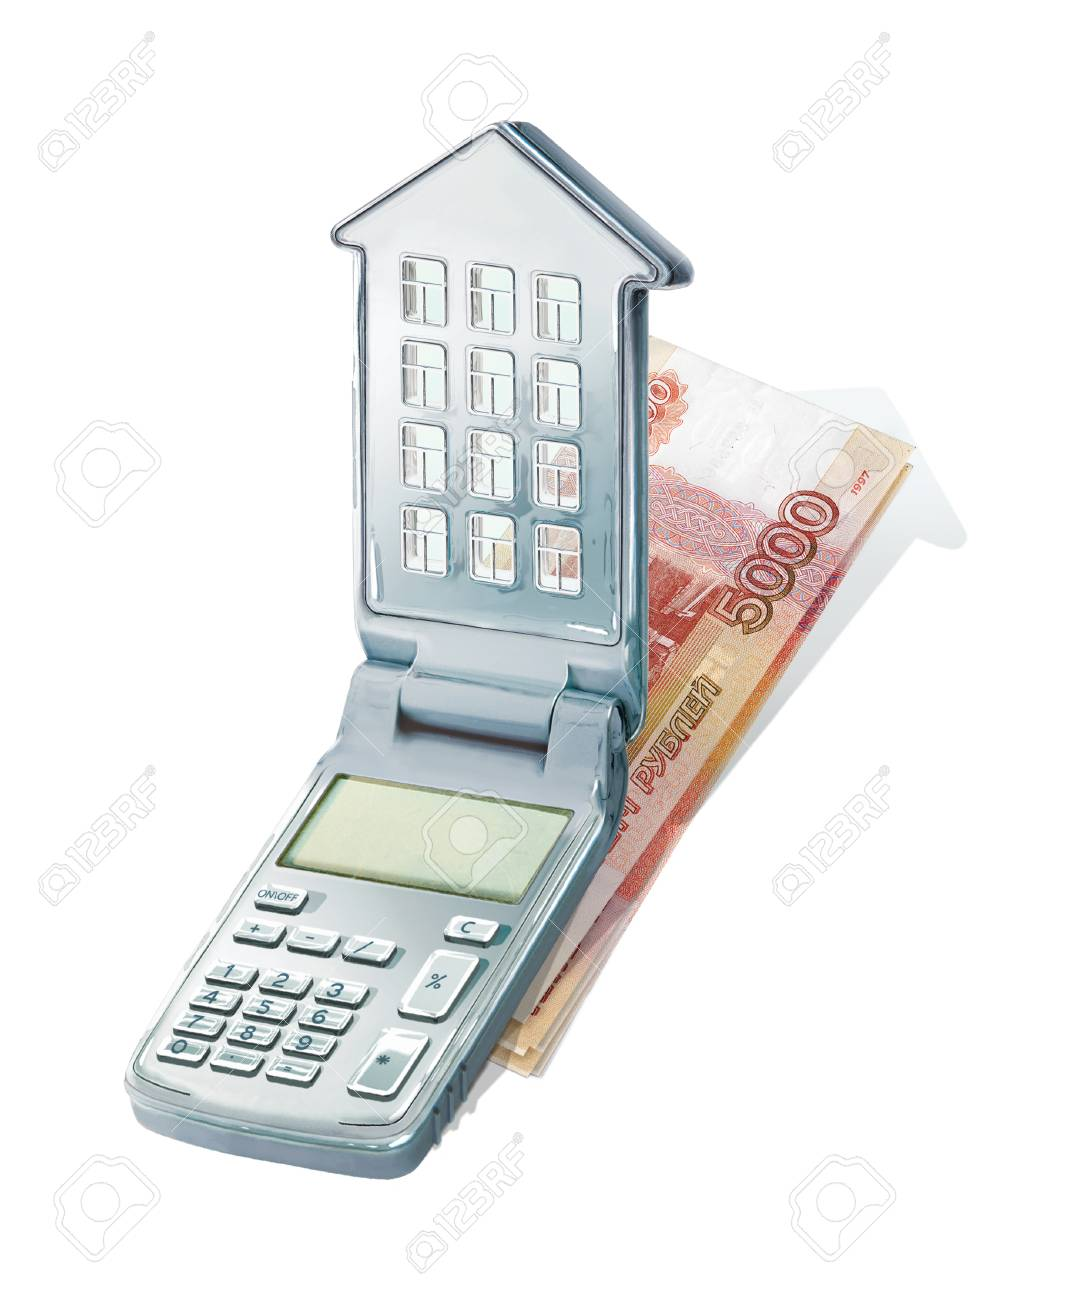 Loanexpert plus main window wakefieldsoft, llc loanexpert is.